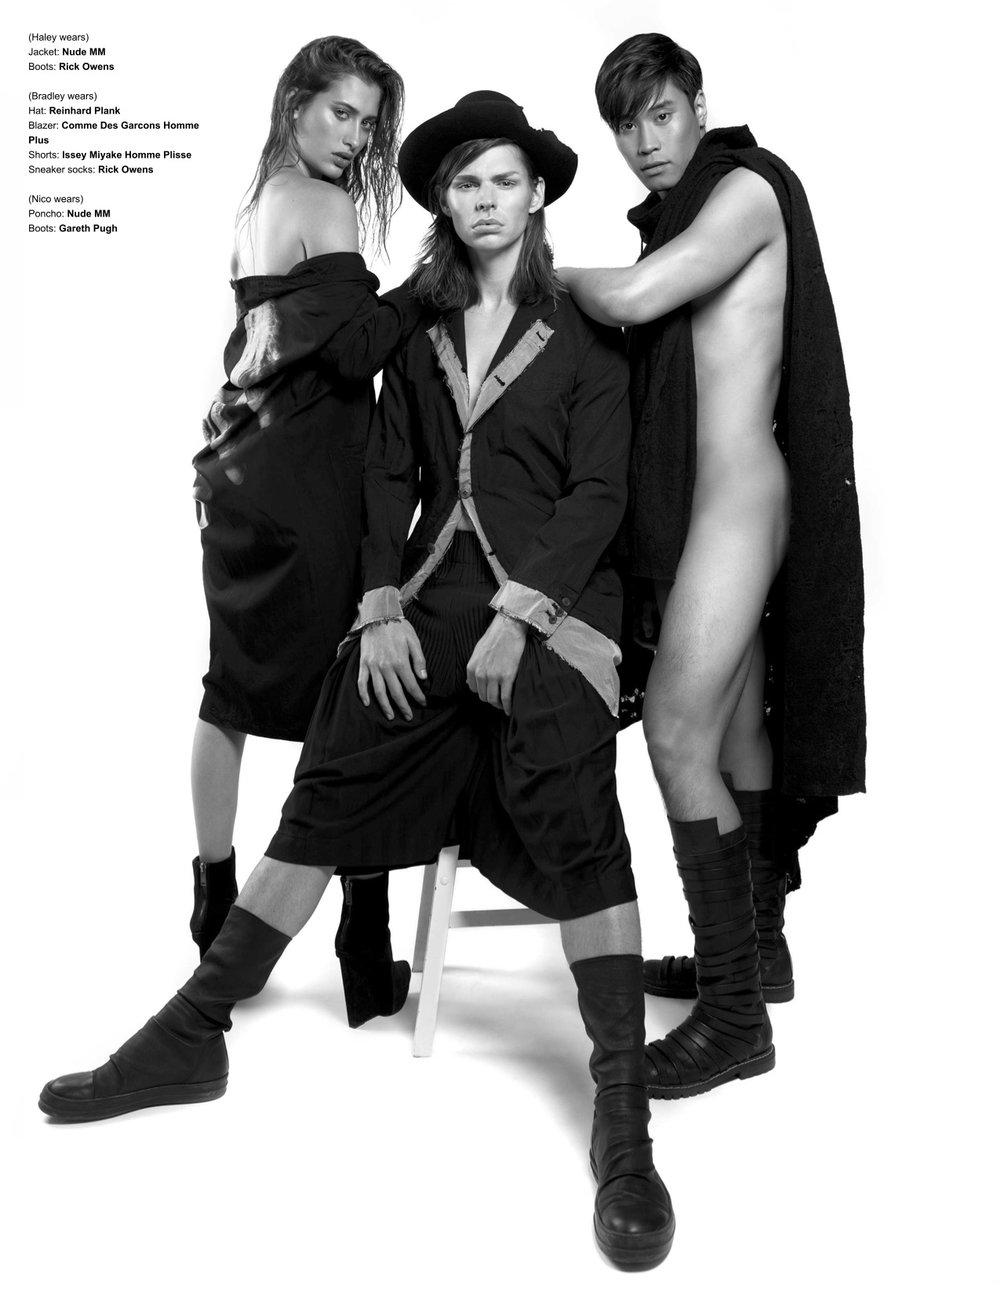 DesnudoMagazineIssue73 copy.jpg